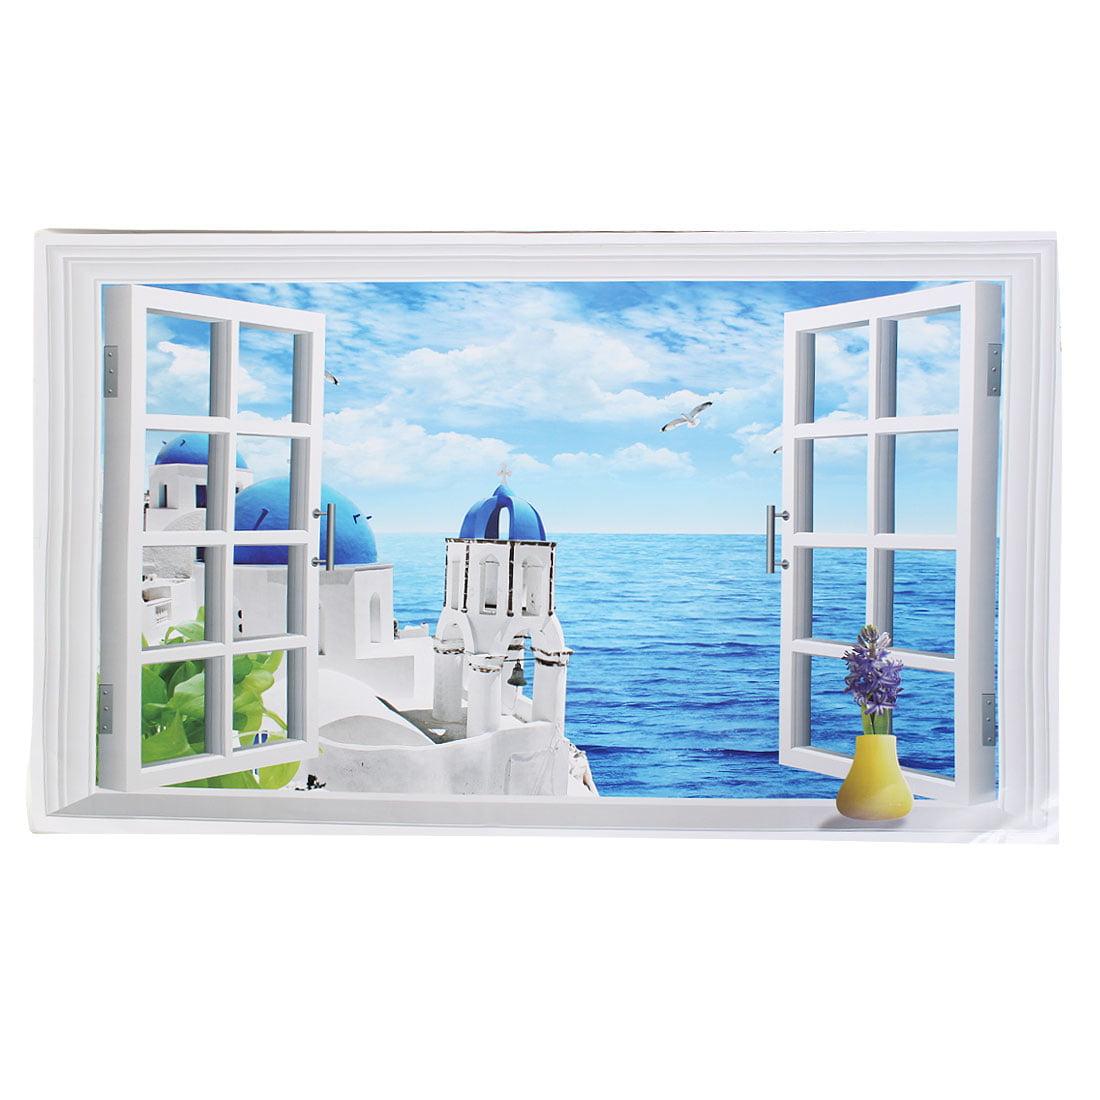 Home Decor Window Seaview Background PVC Wall Sticker Wallpaper